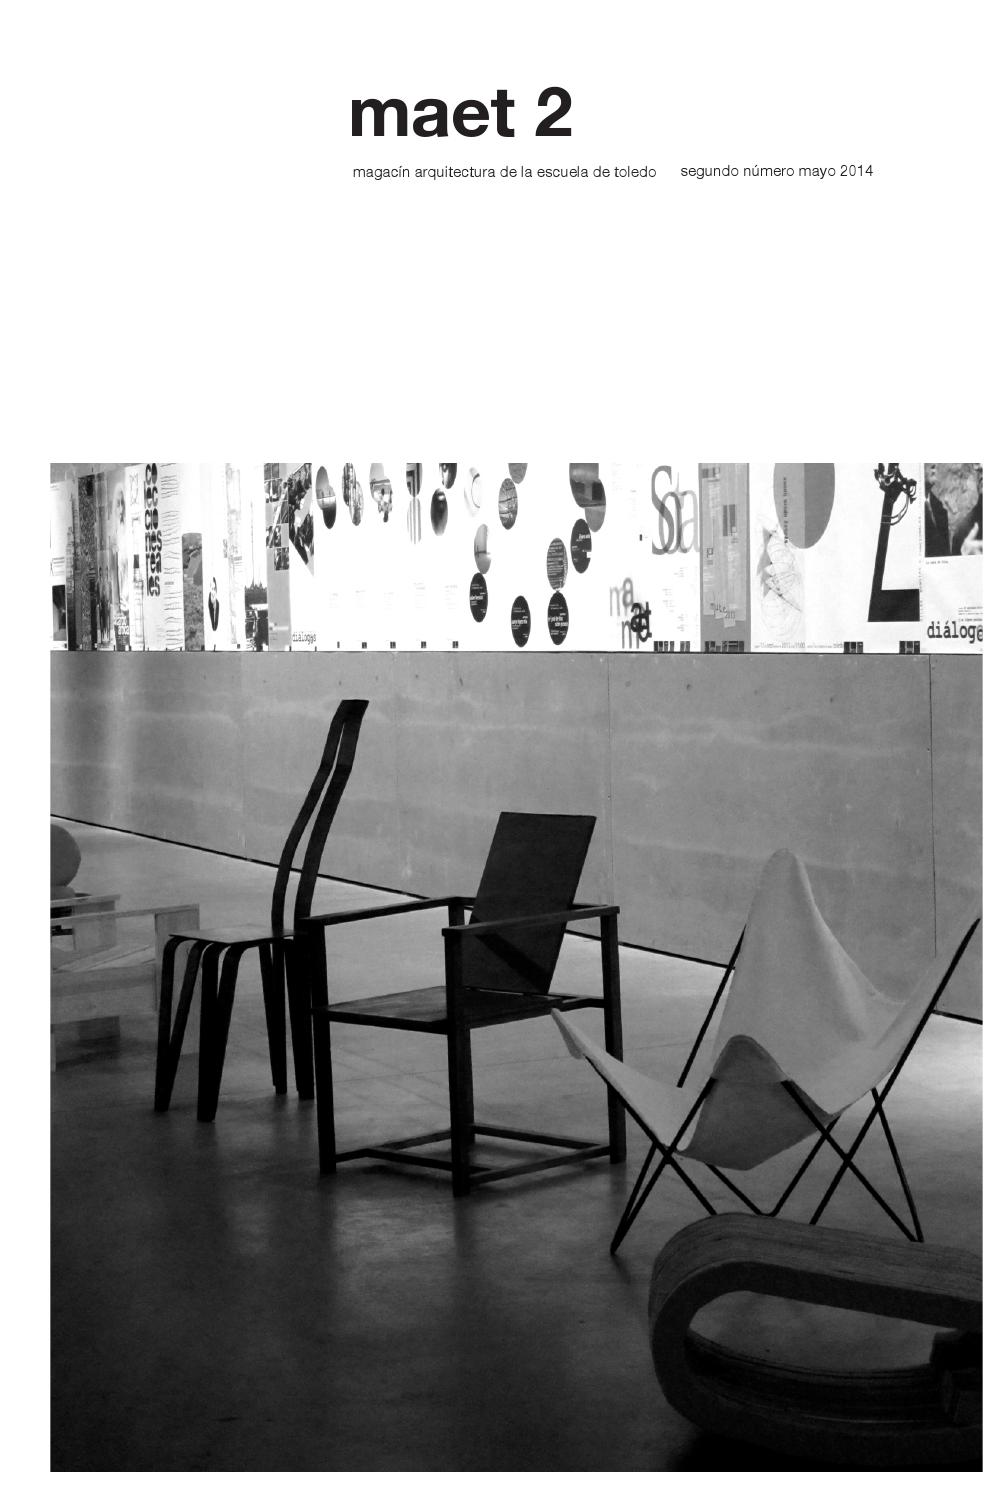 maet nº 2 by eaT<escuela de arquitectura de Toledo - issuu